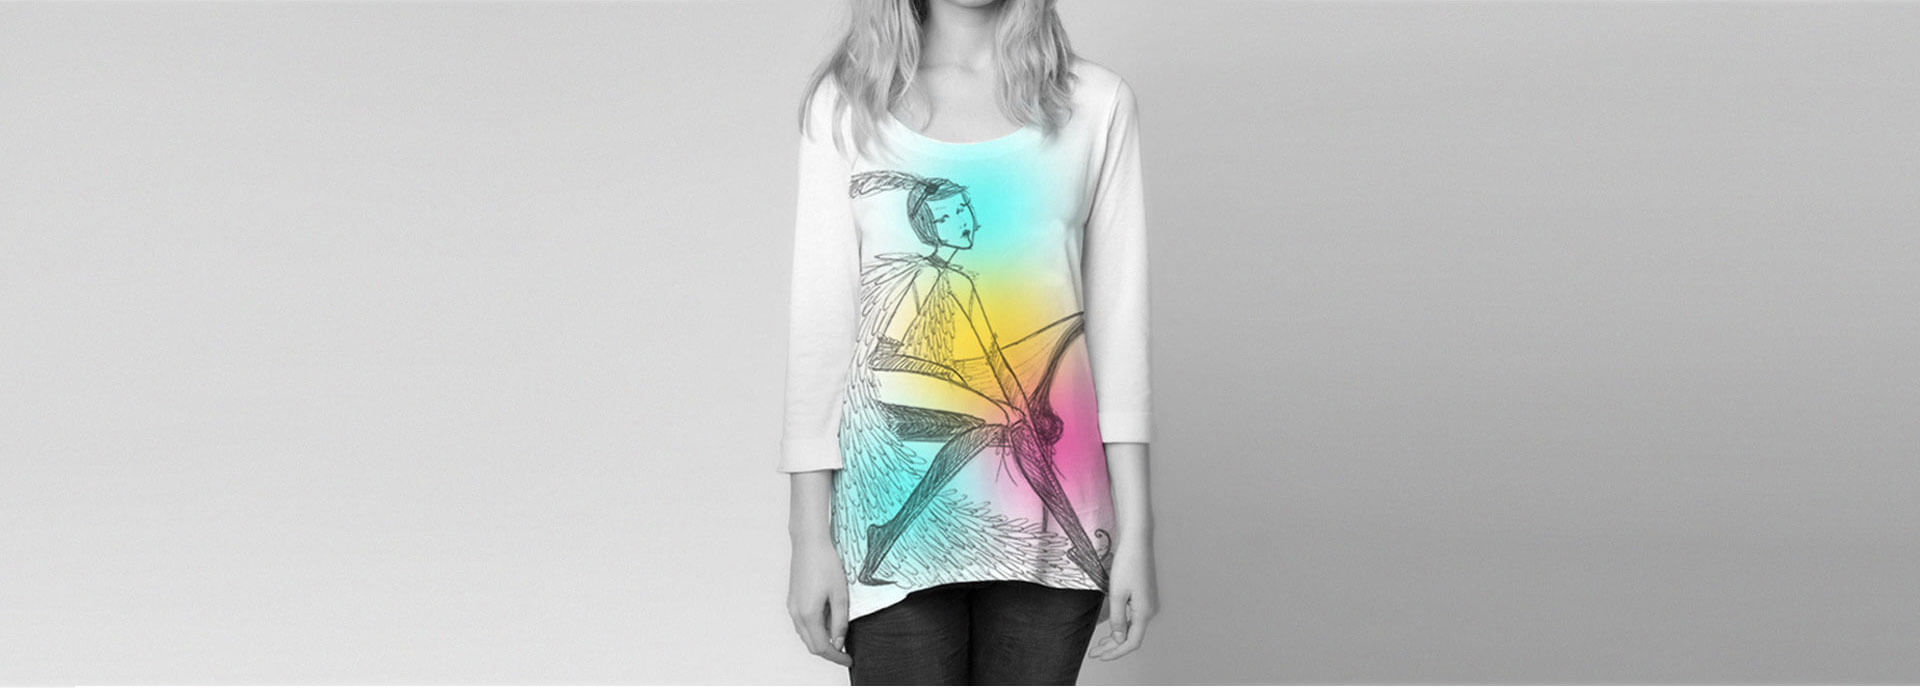 Tshirt-design-feat